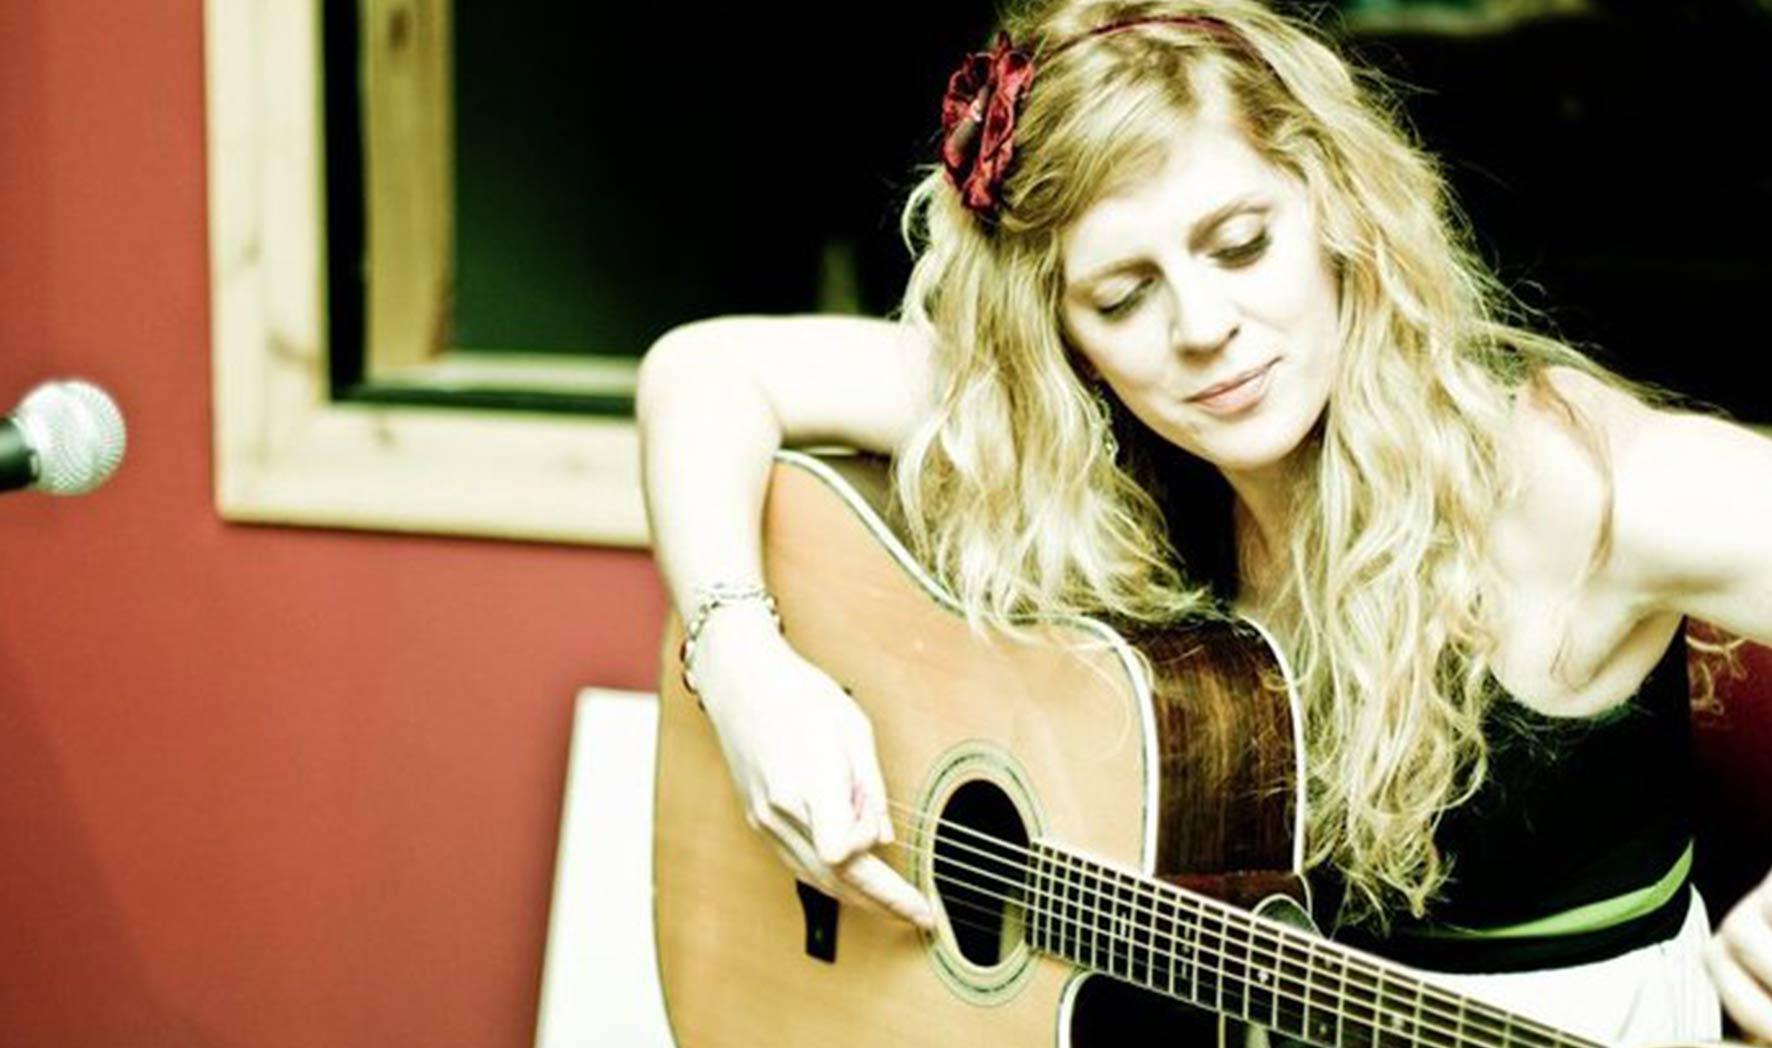 Molly Winters